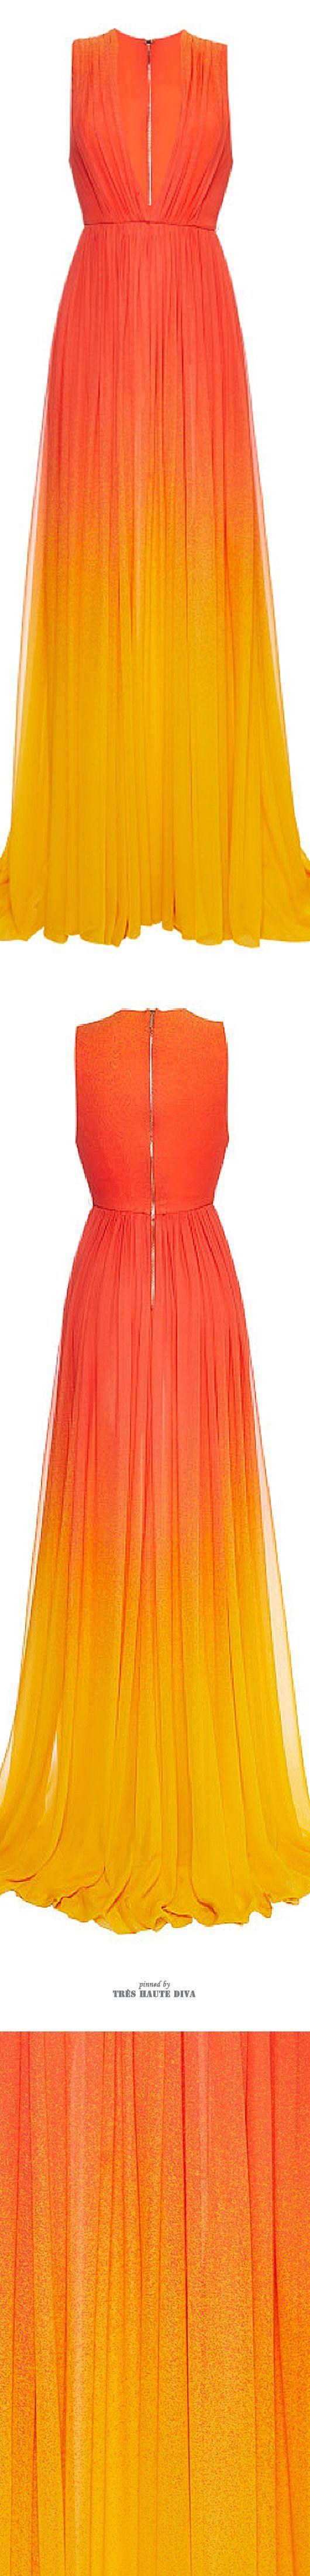 Ellie Saab Red Degrade Silk Georgette Dress ♔ SS 2015